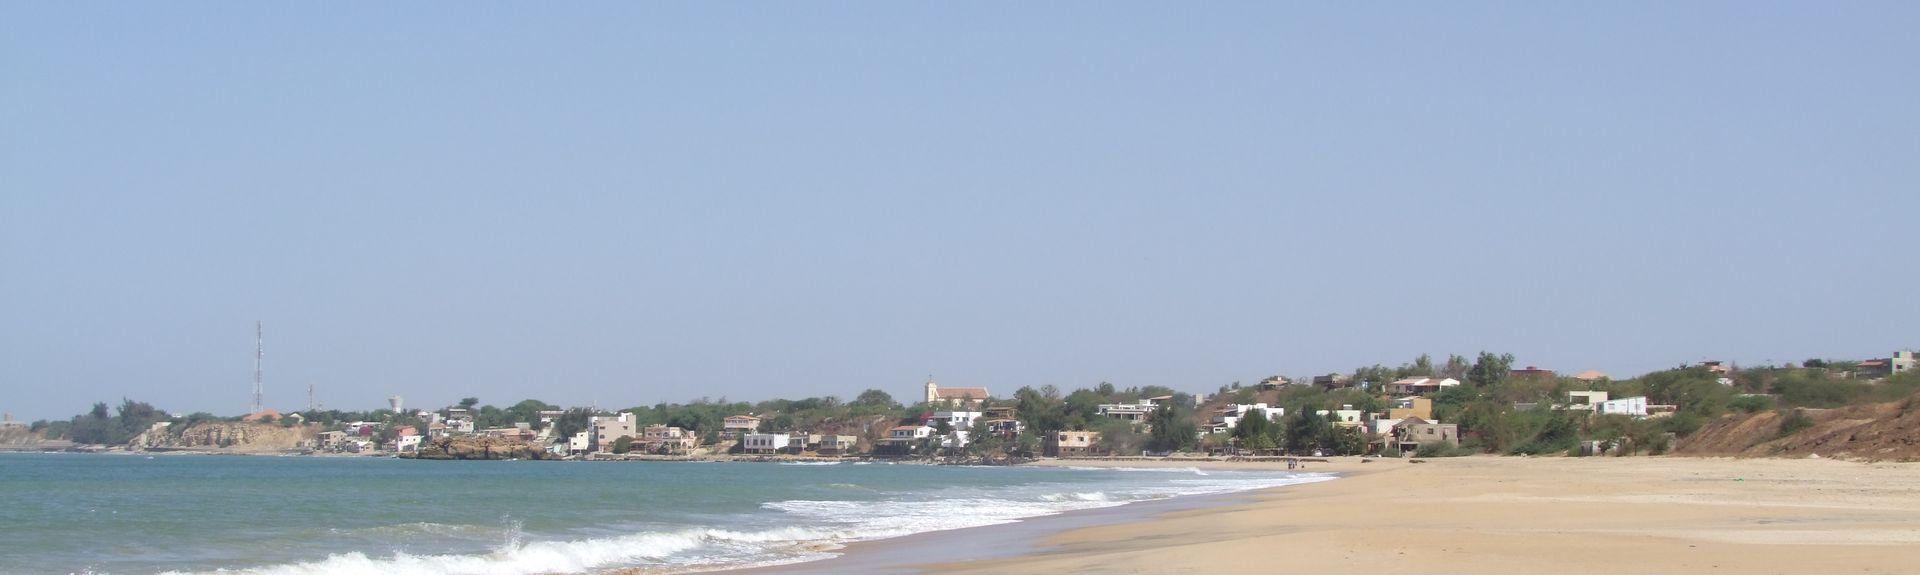 La Somone, Thiès, Sénégal